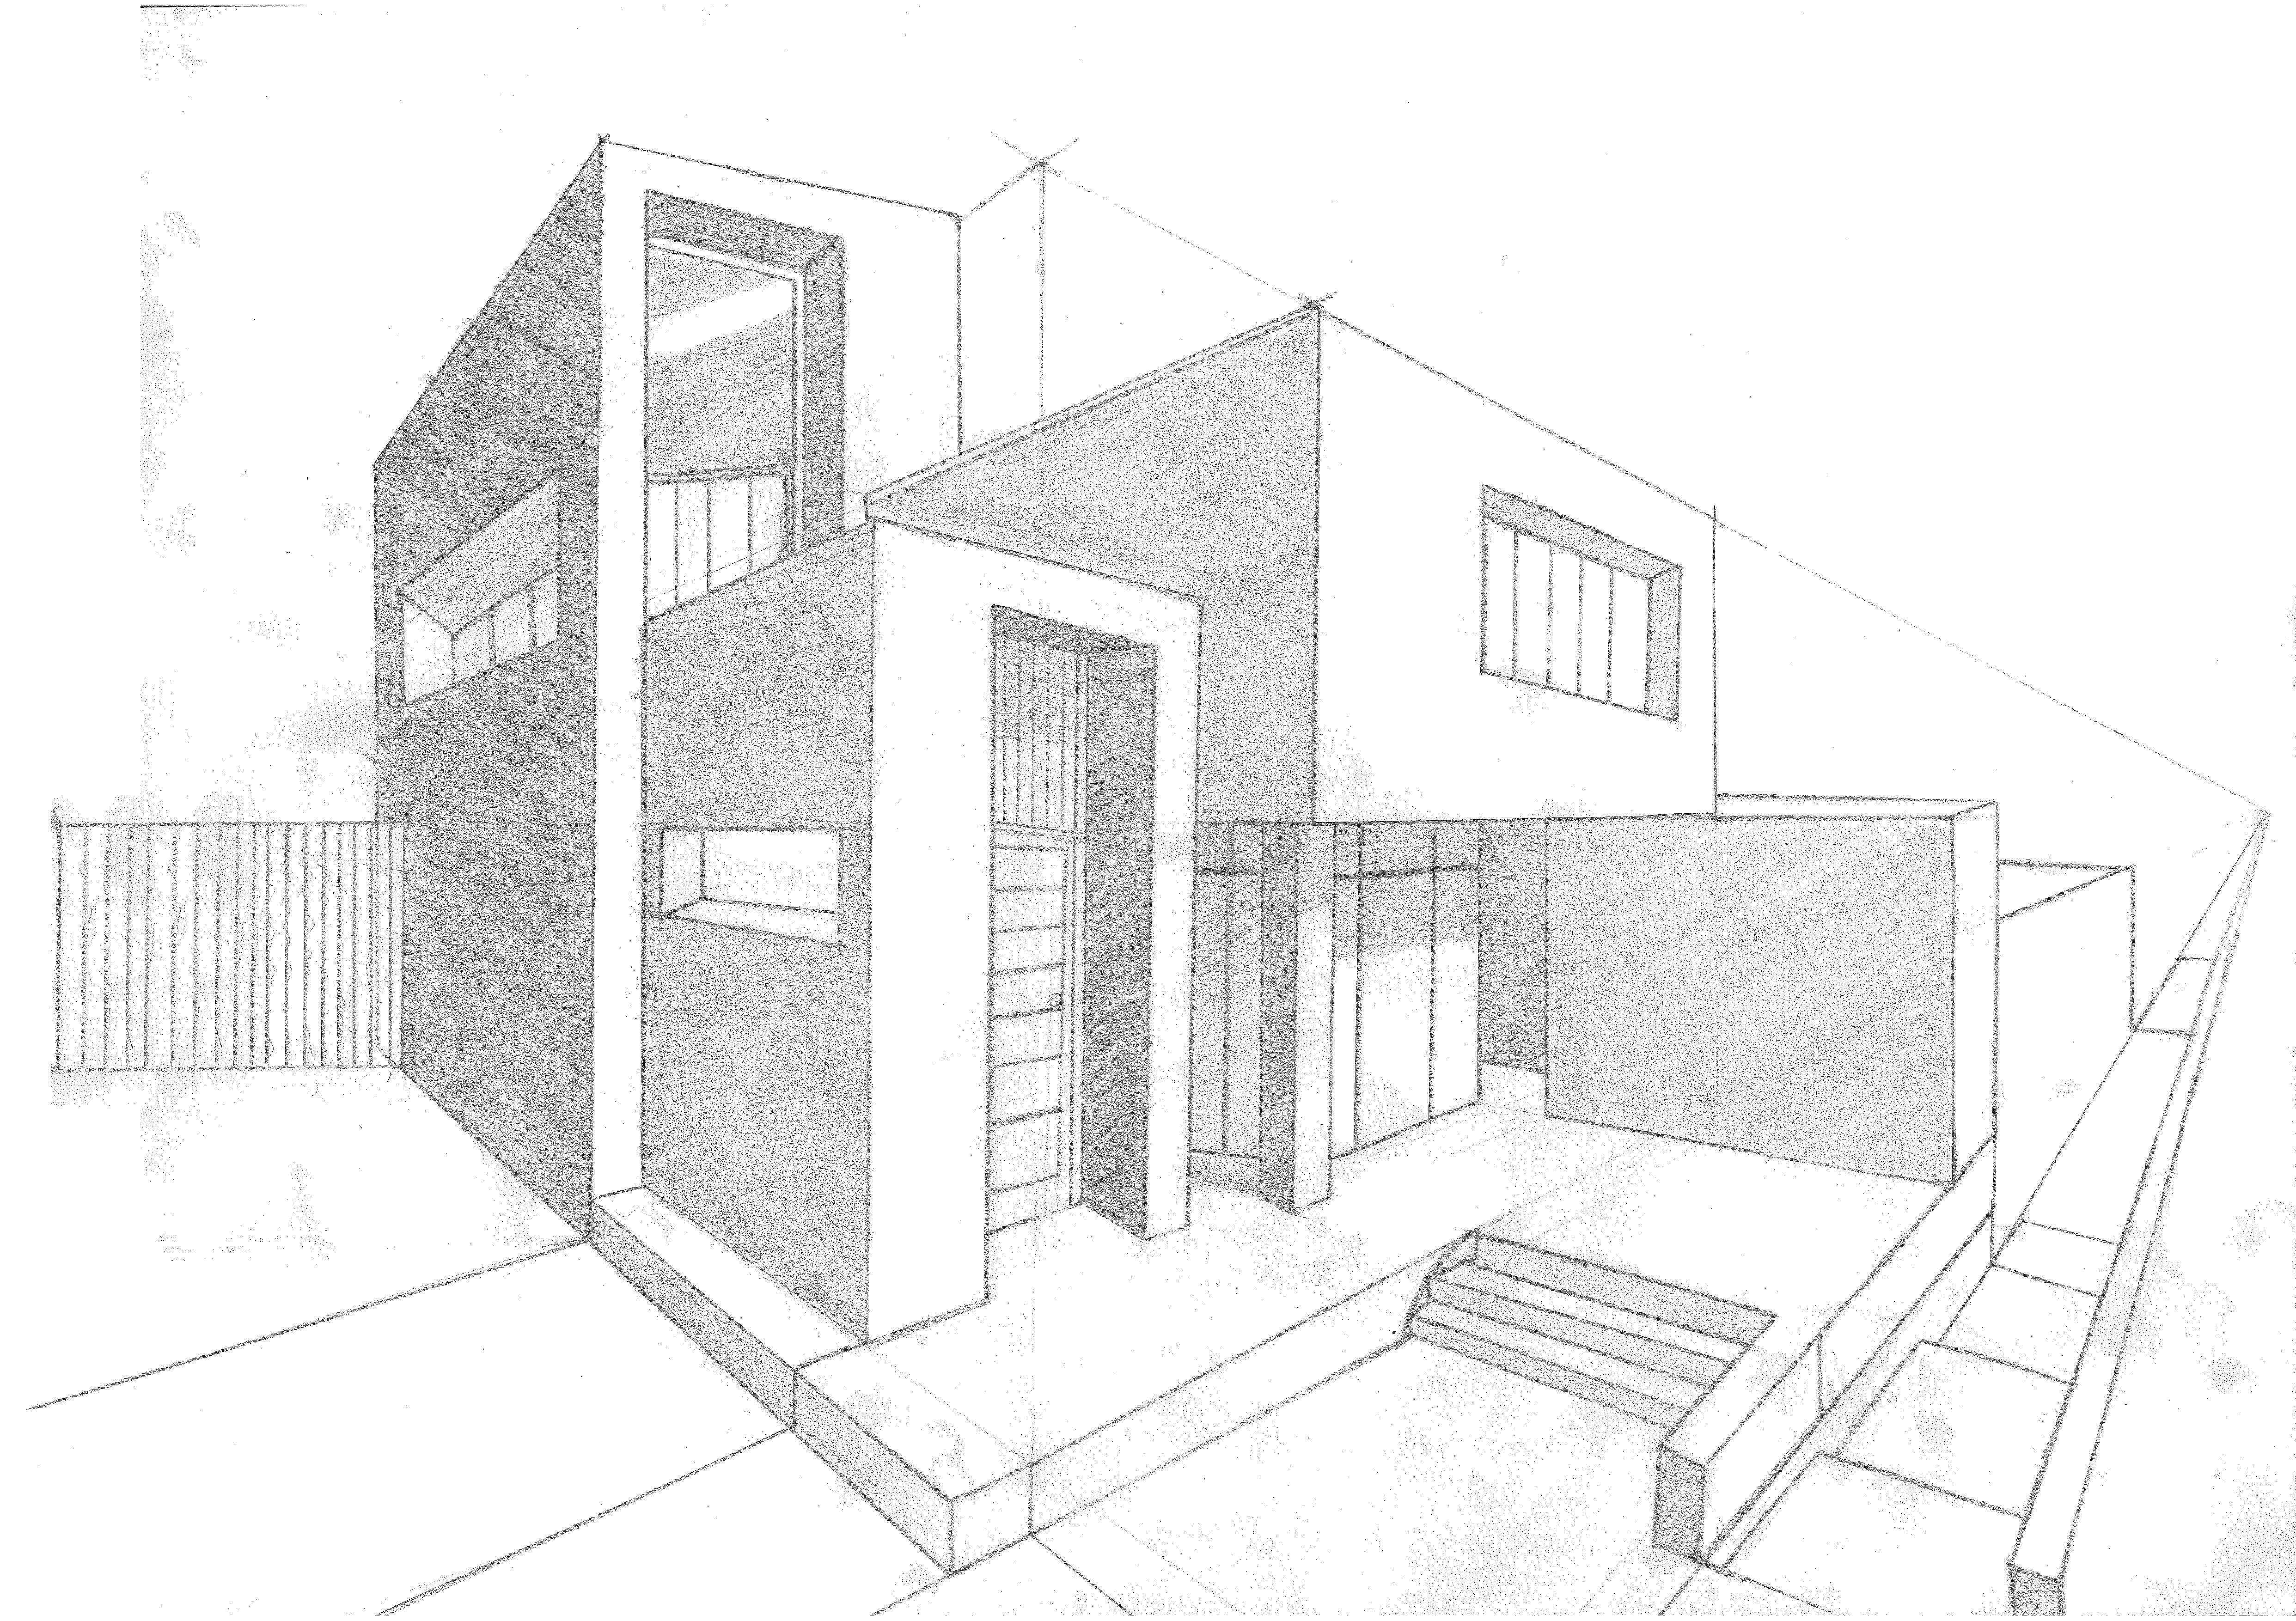 Pin de Eli Gutiérrez en My Online Portfolio | Bocetos arquitectura, Dibujo  de arquitectura, Dibujos de arquitectura